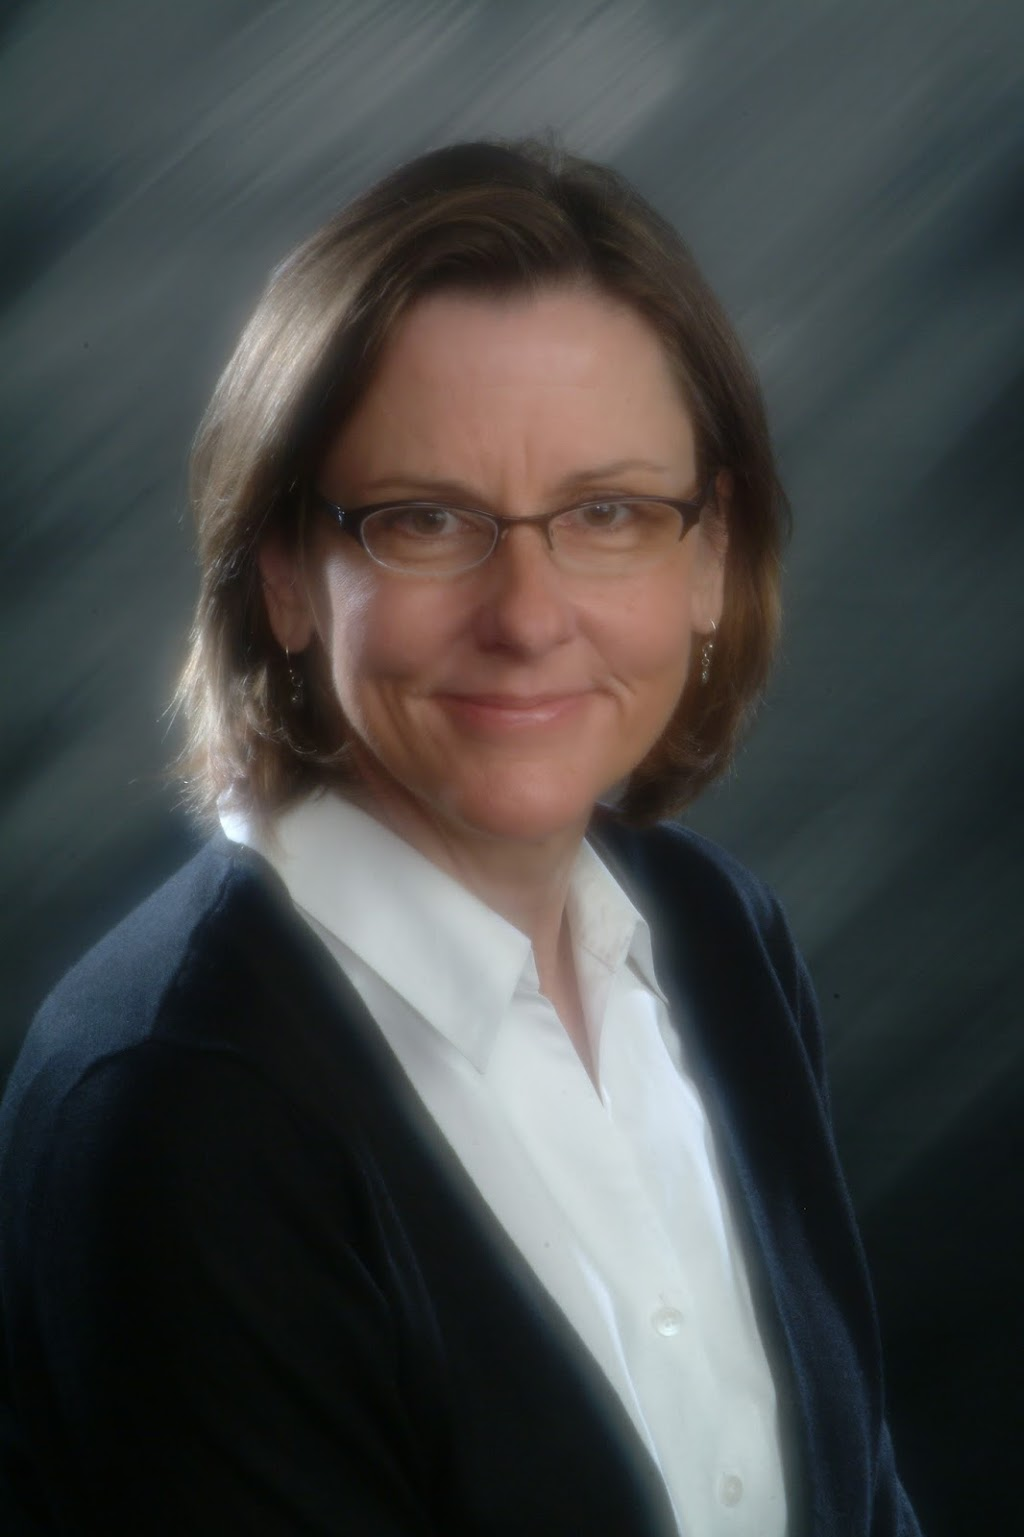 Germanson MD Psychiatry Ltd - doctor  | Photo 1 of 1 | Address: 13911 Ridgedale Dr #320, Minnetonka, MN 55305, USA | Phone: (952) 956-4057